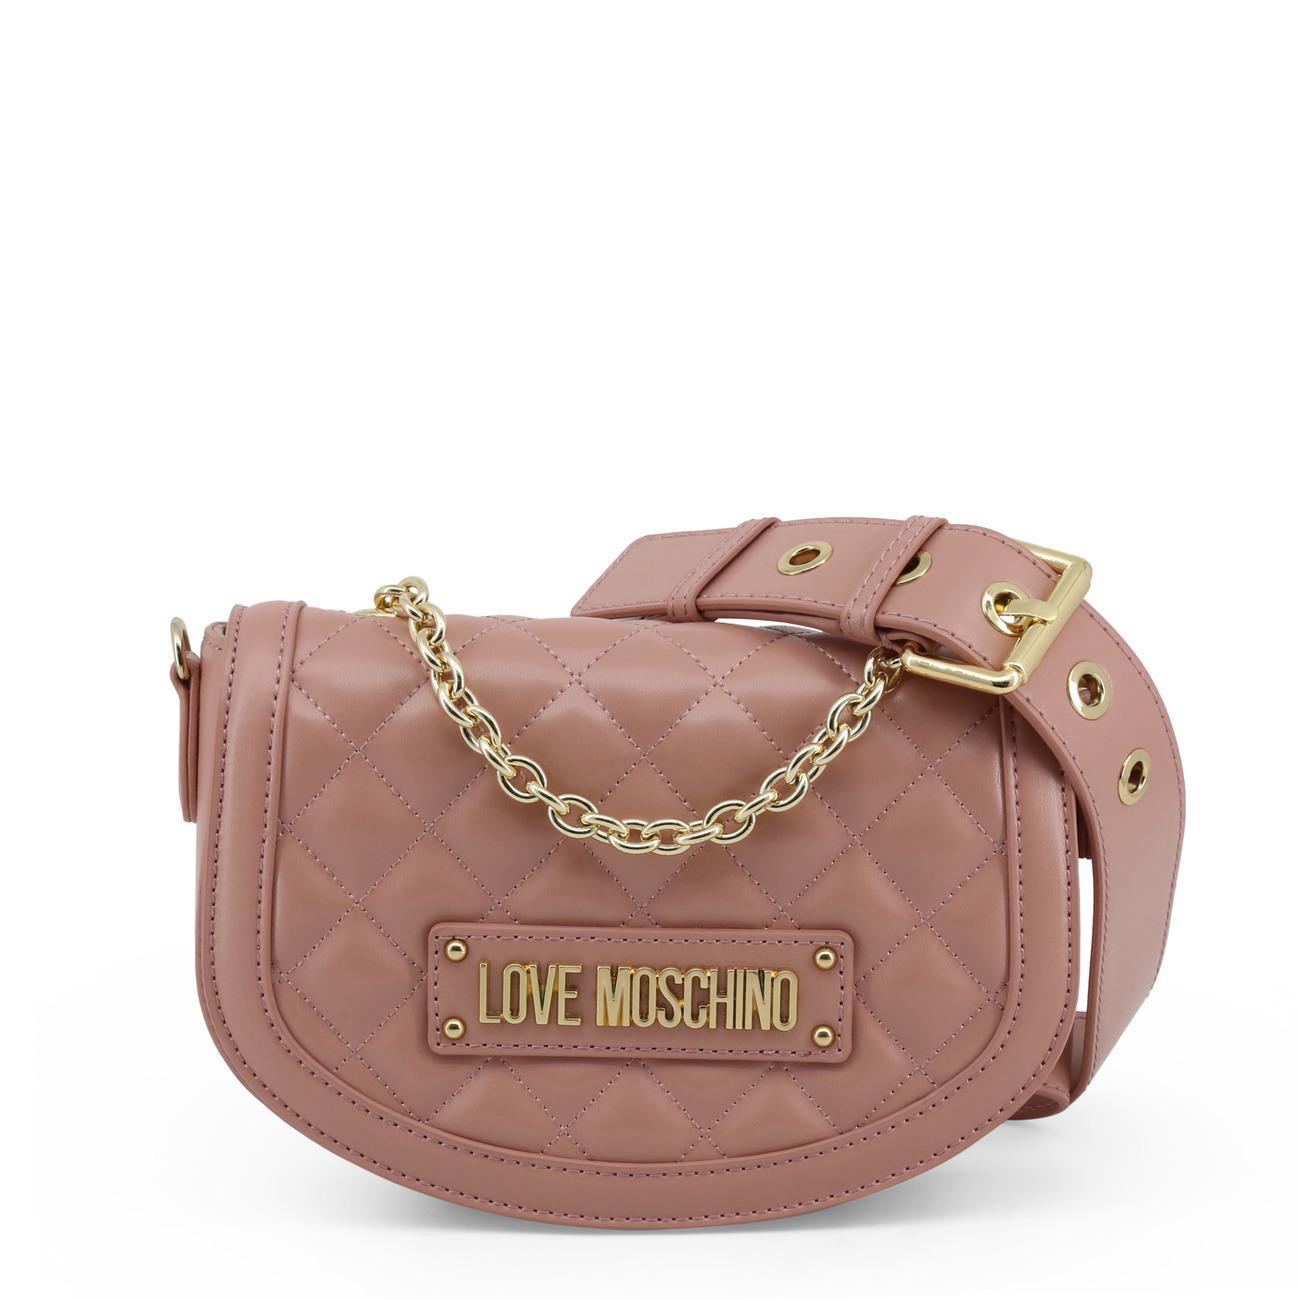 Love Jc4002pp17la Bandoulière Femme Sac Moschino AL5qRj34